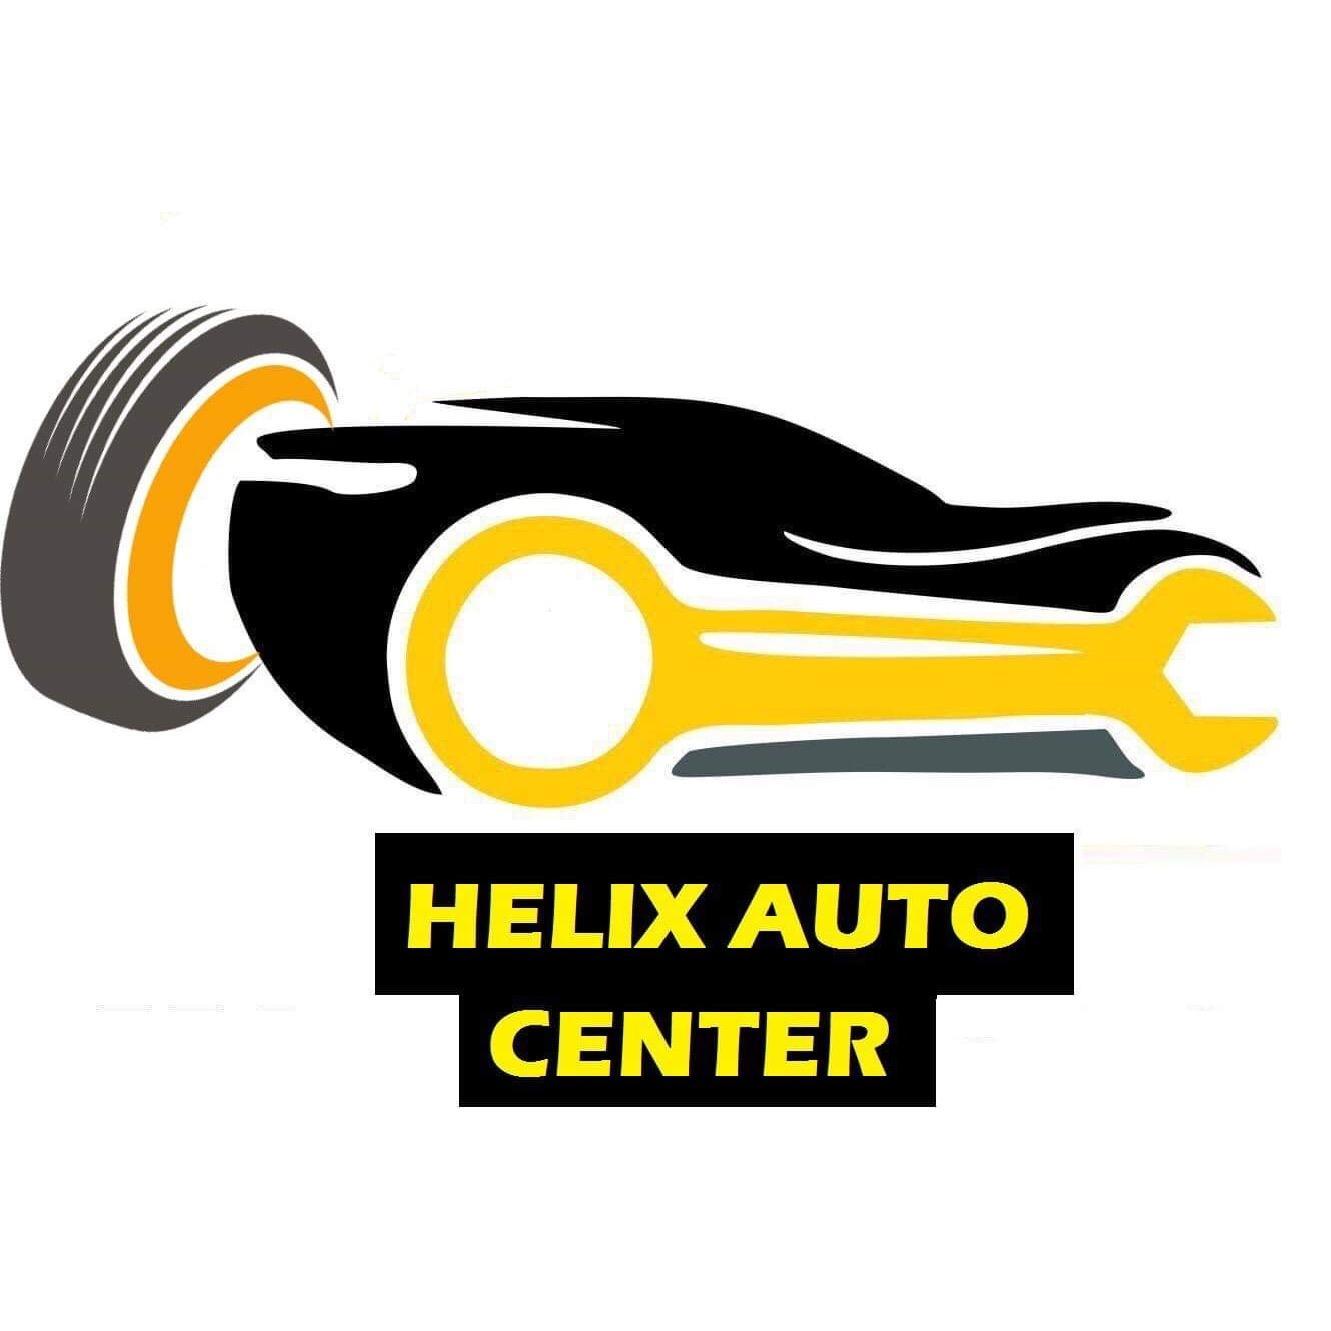 Helix auto center